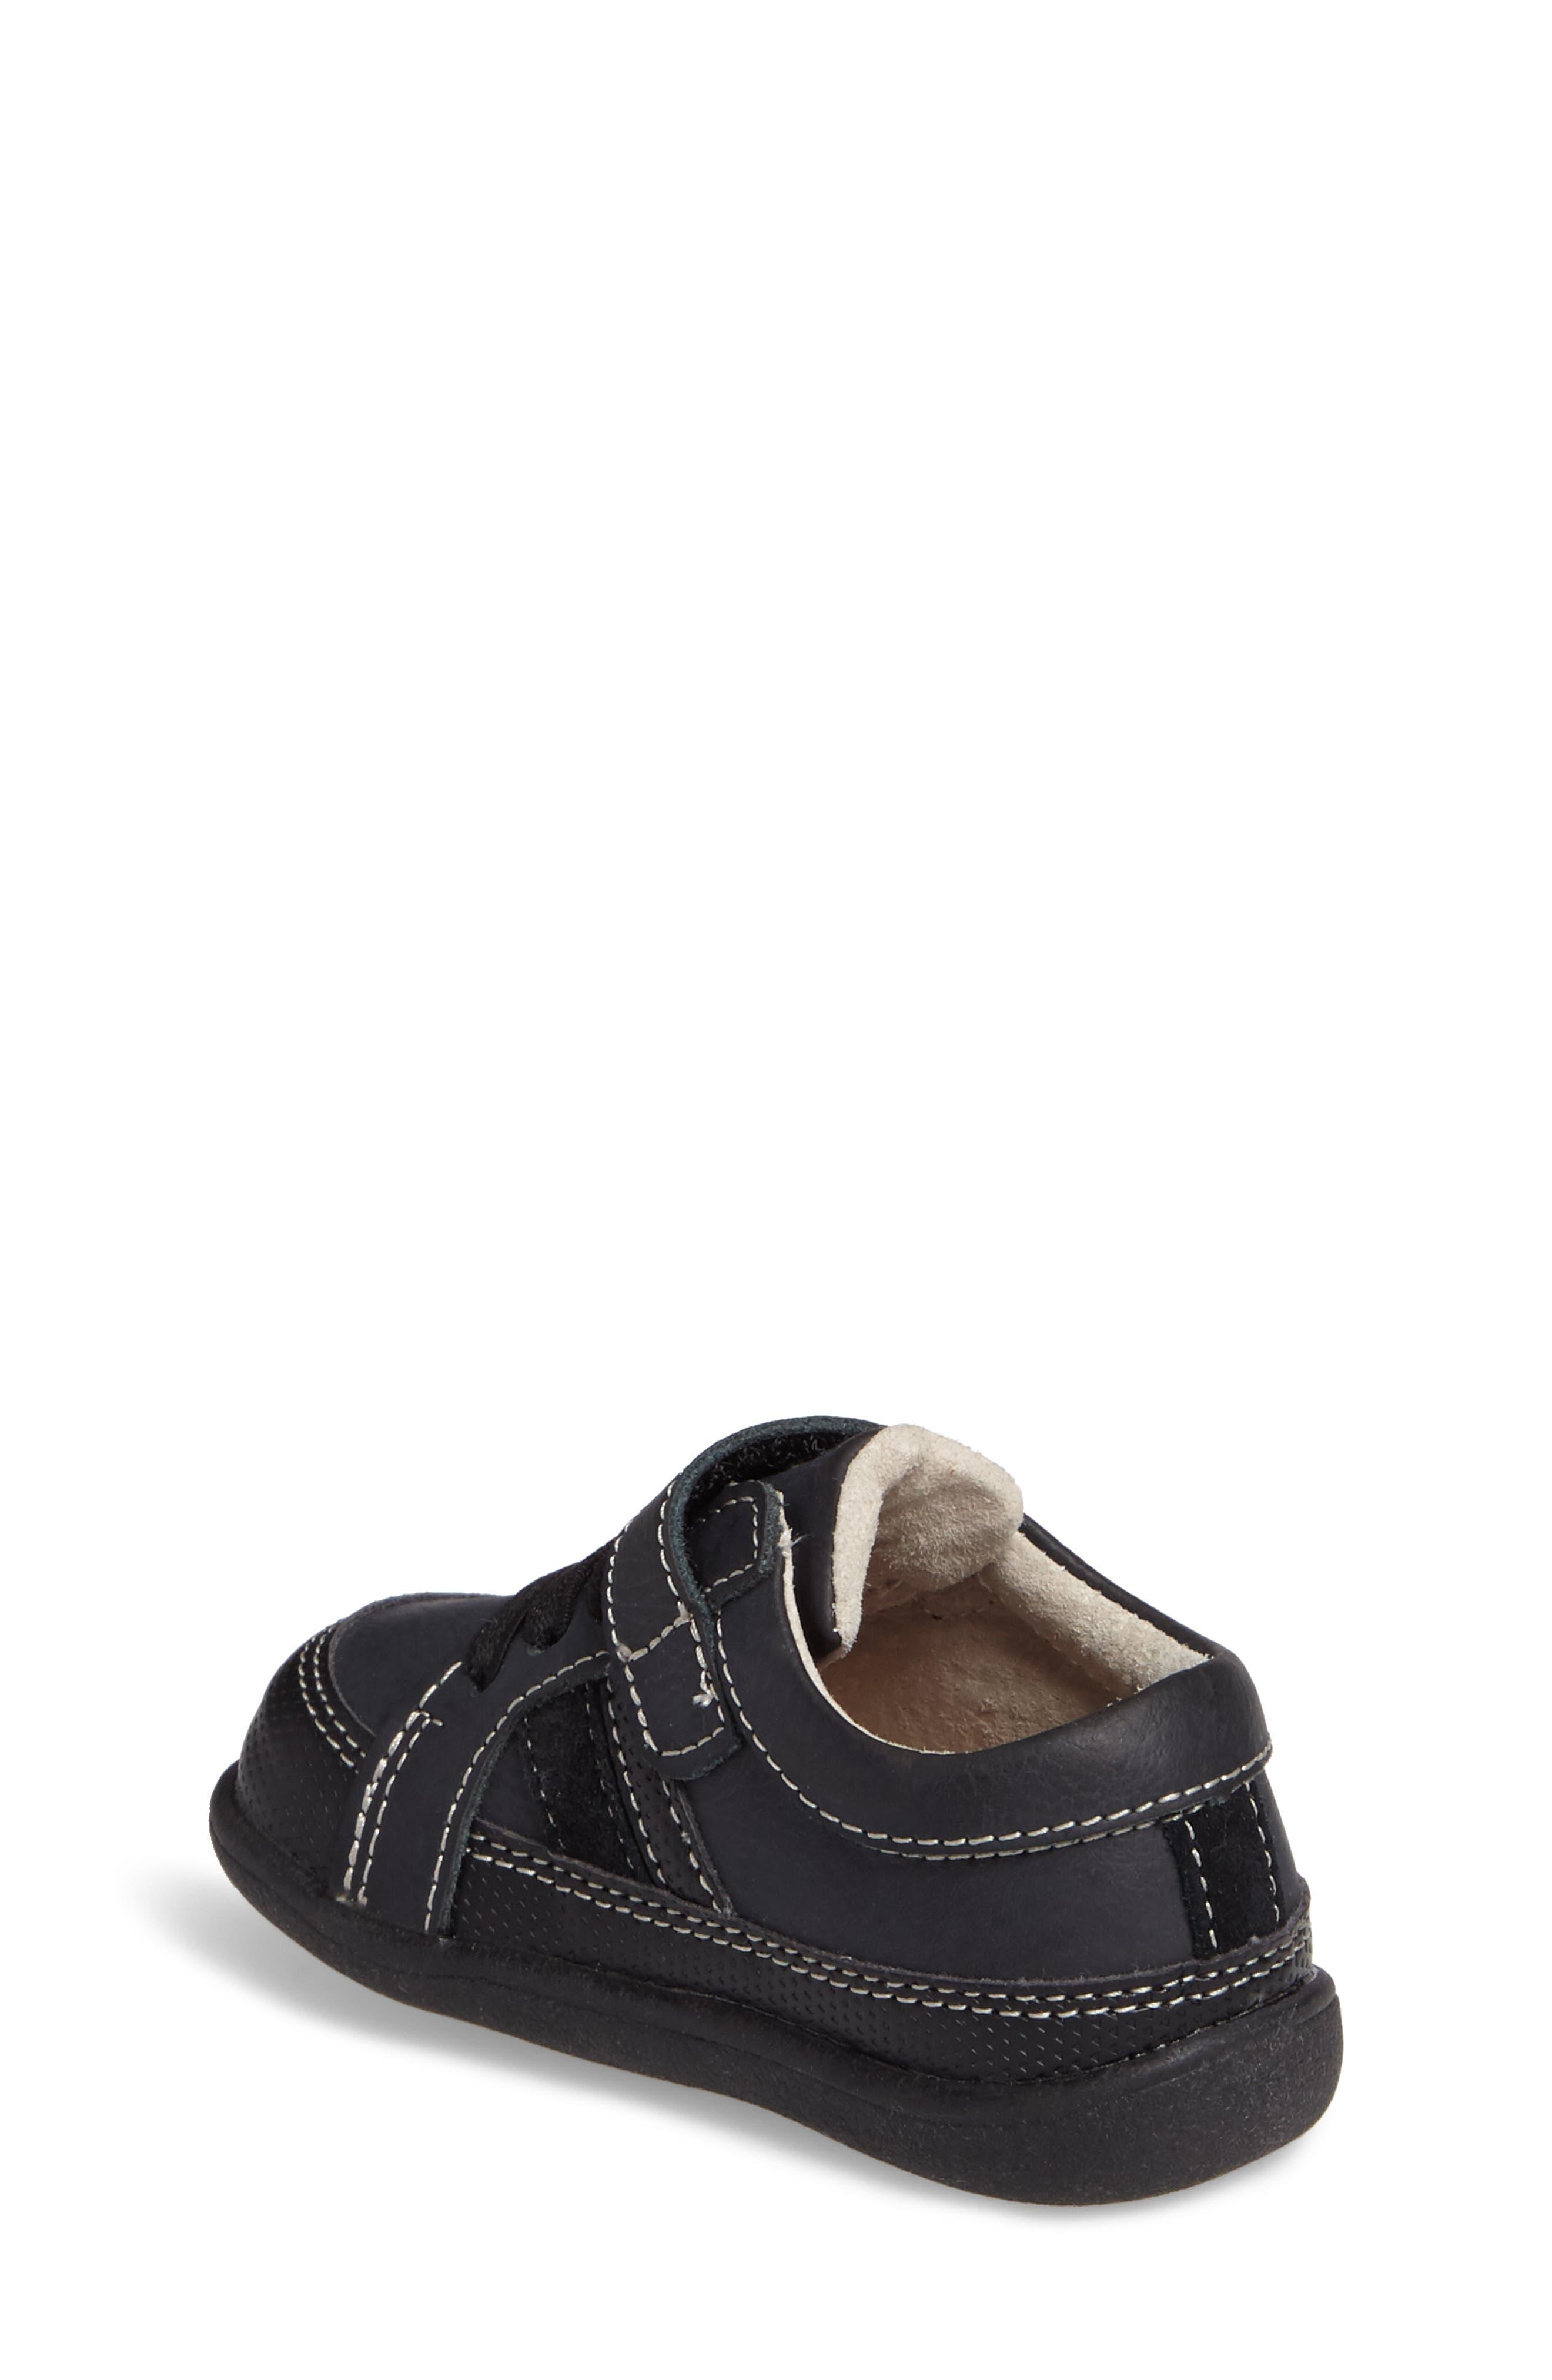 Randall II Sneaker,                             Alternate thumbnail 2, color,                             Black